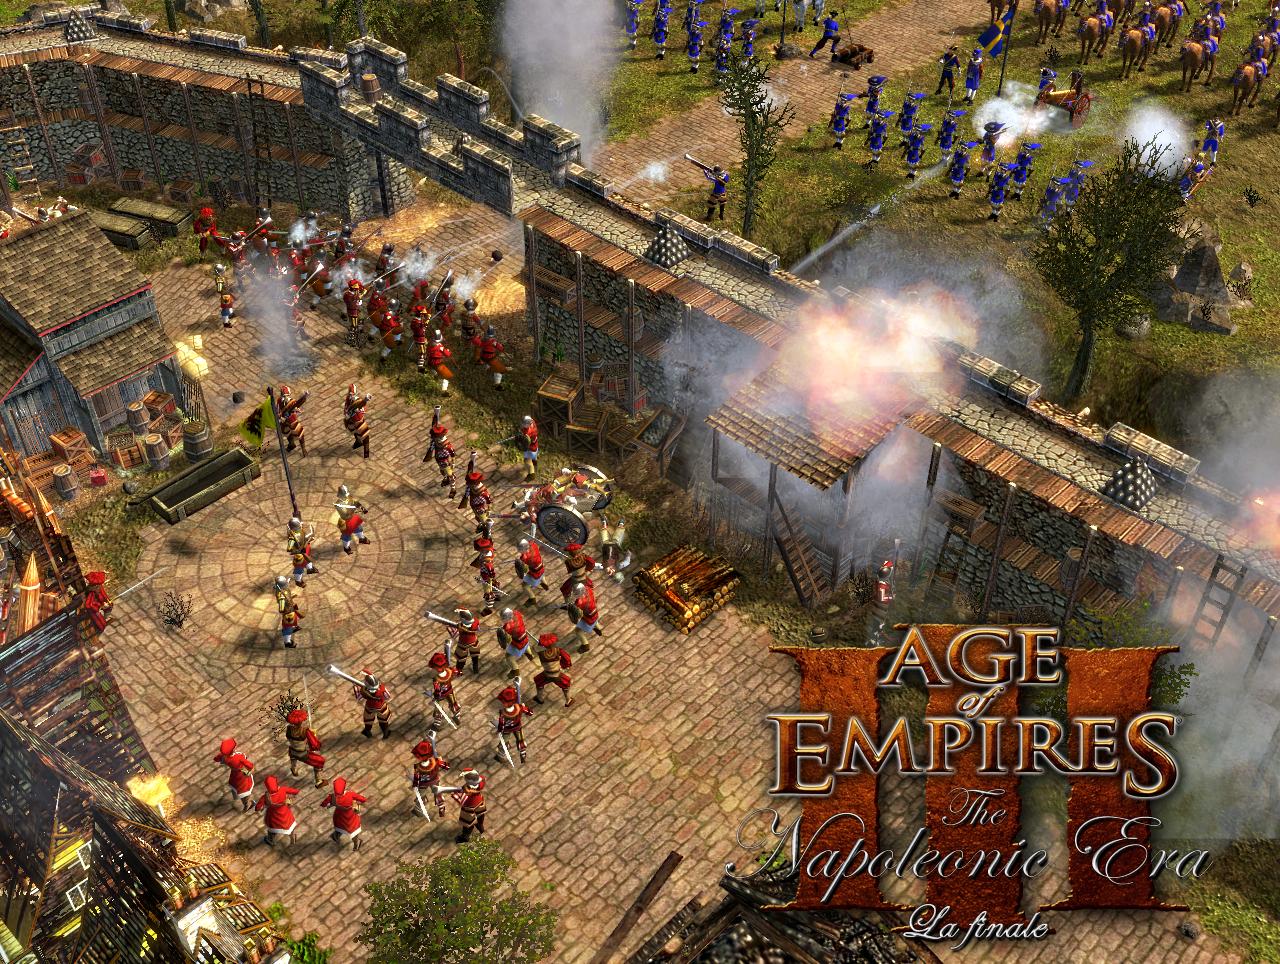 Age of Empires 3: oyun kodları